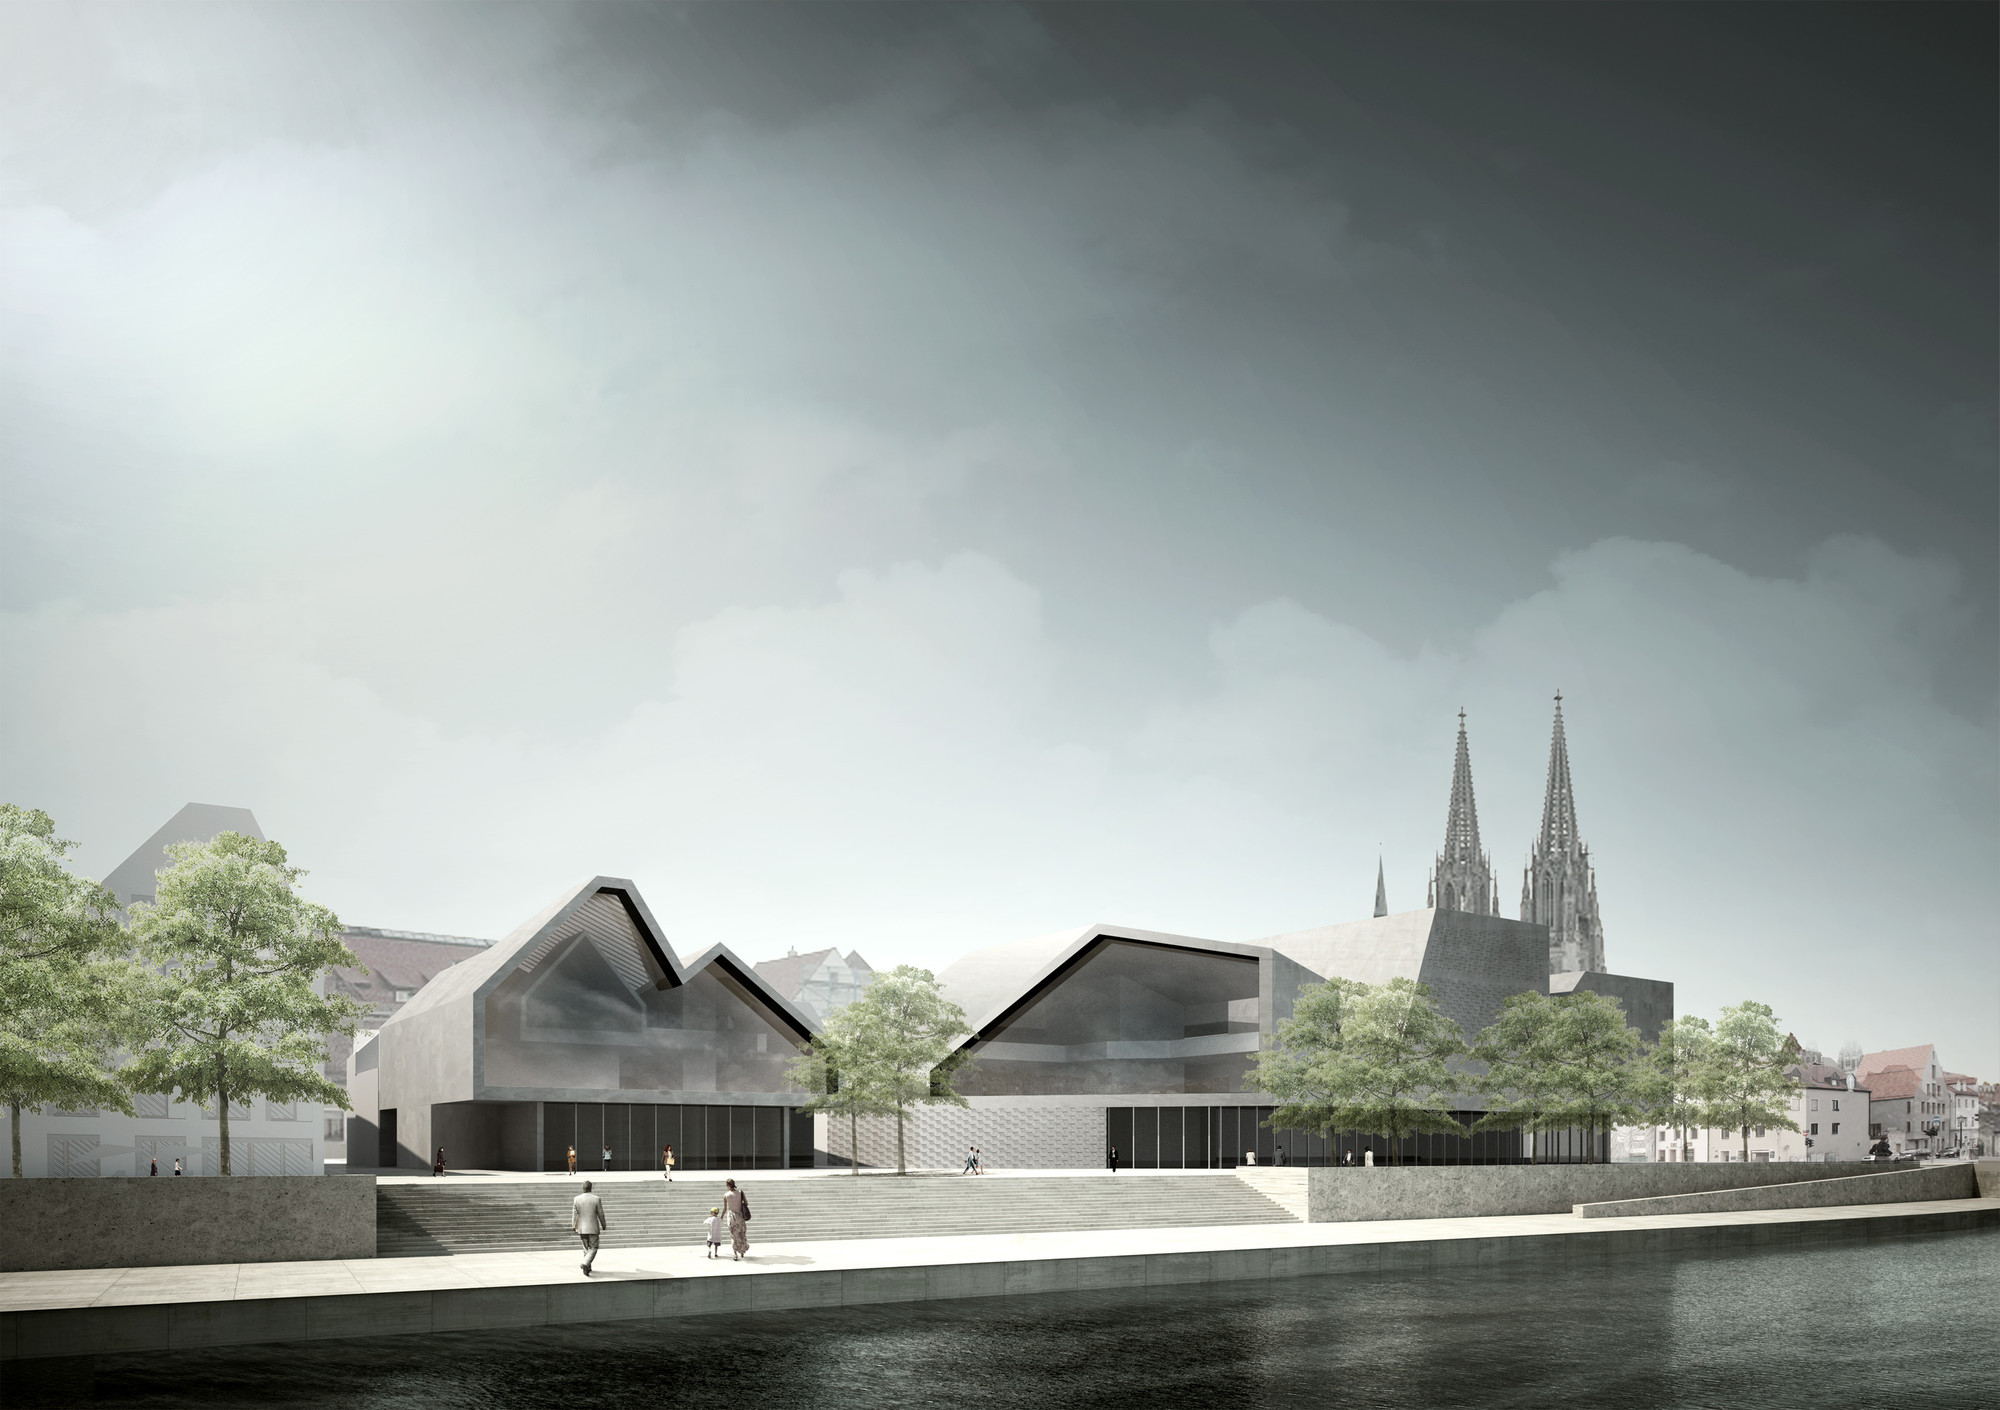 Museum of Bavarian History Competition Entry / Simon Takasaki Architecture + Research Studio, Courtesy of Simon Takasaki & Dietmar Köring